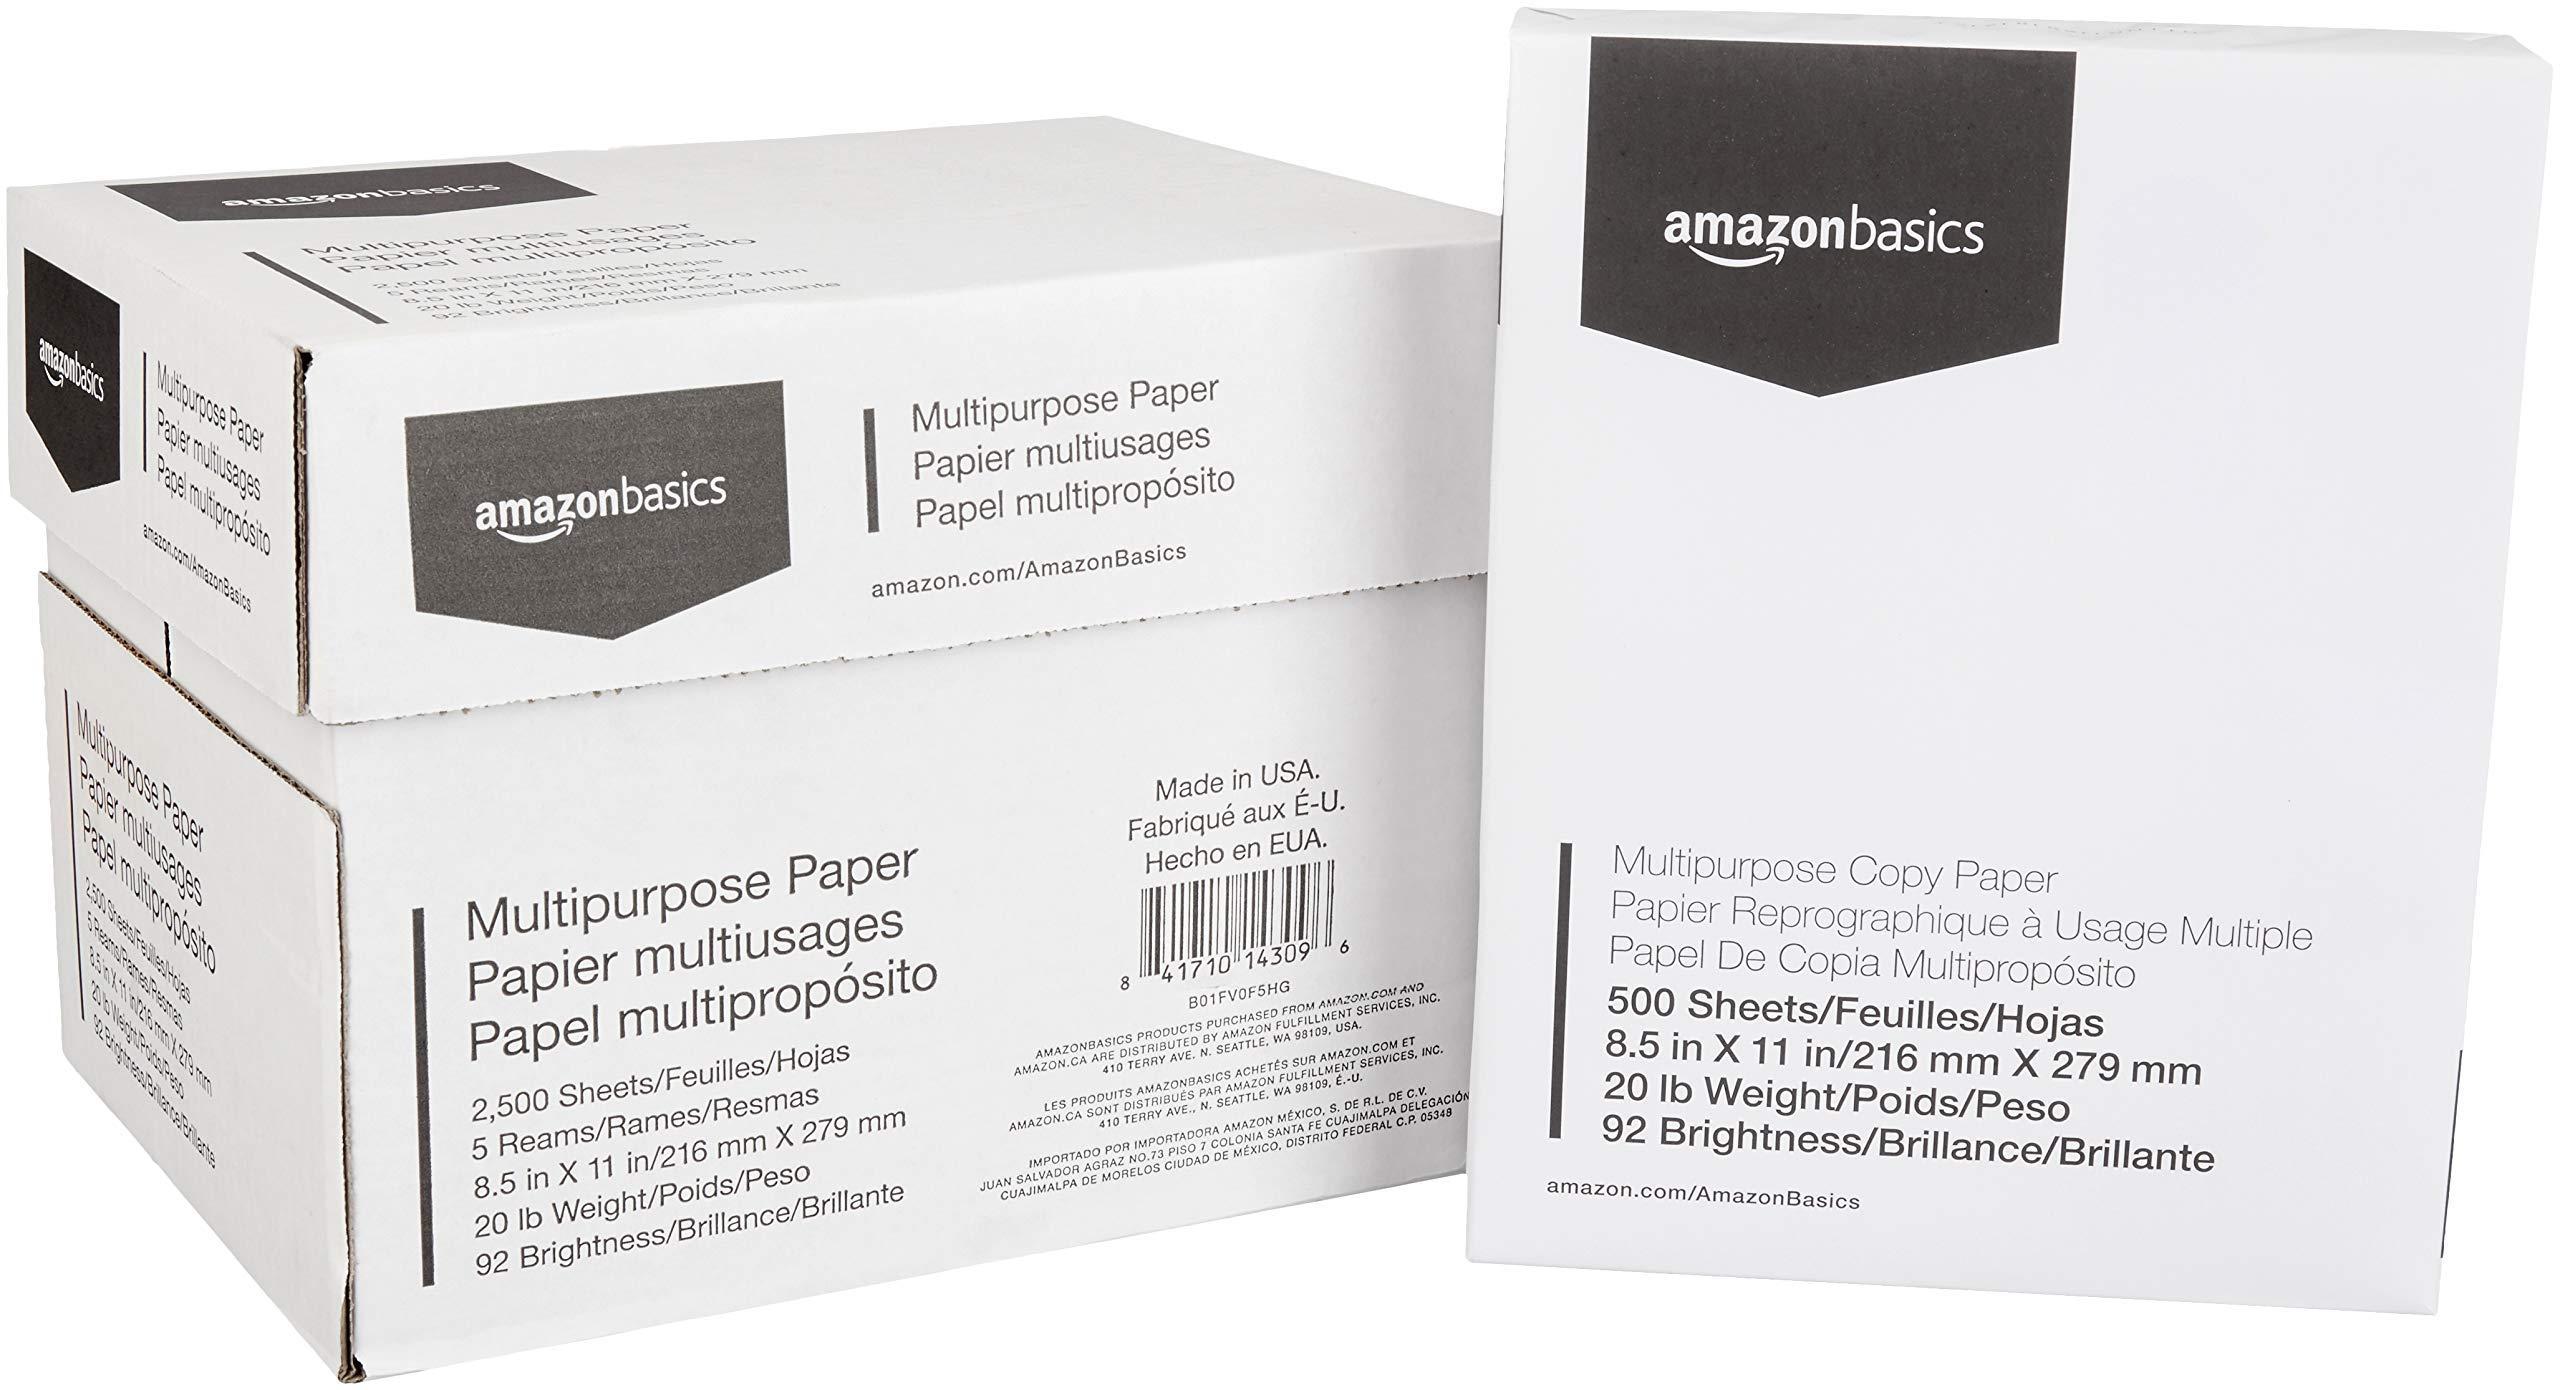 AmazonBasics 92 Bright Multipurpose Copy Paper - 8.5 x 11 Inches, 5 Ream Case (2,500 Sheets) (Renewed)